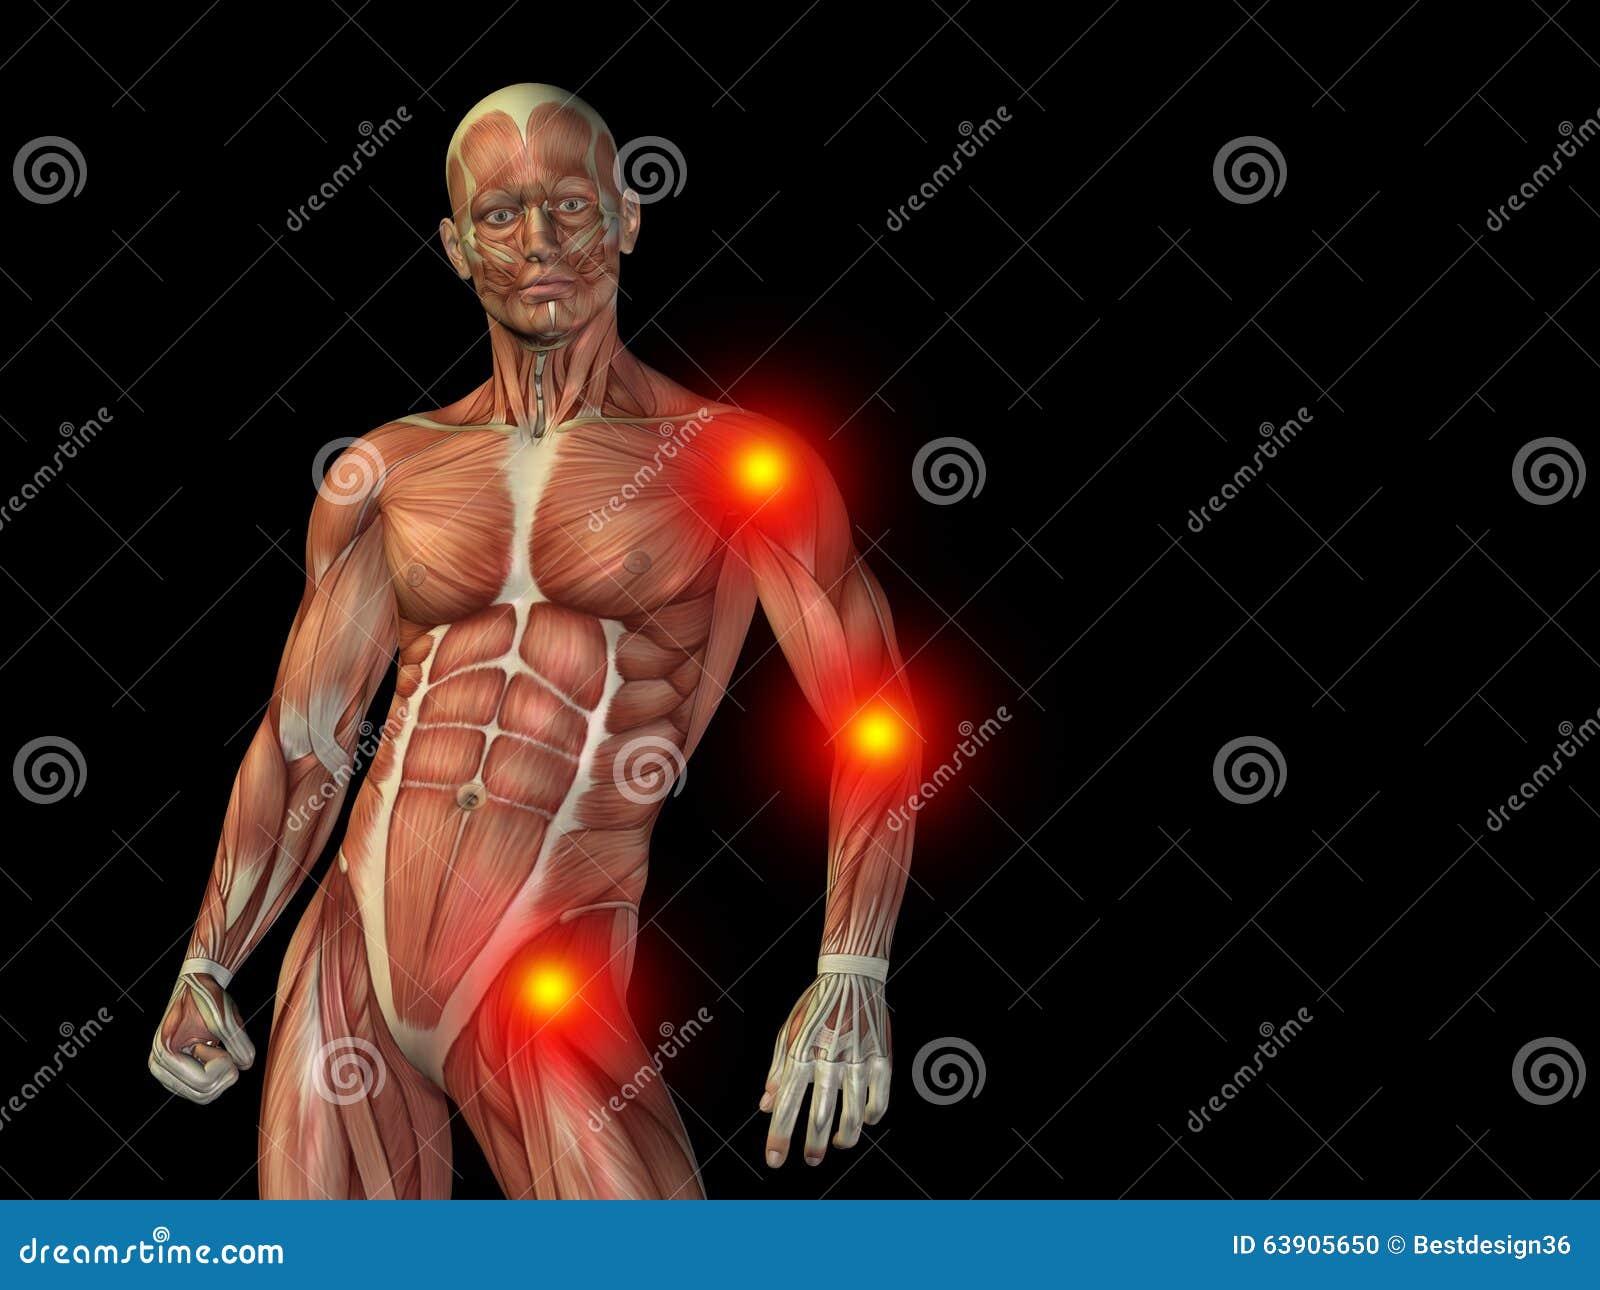 Conceptual Human Body Anatomy Pain On Black Stock Photo - Image of ...